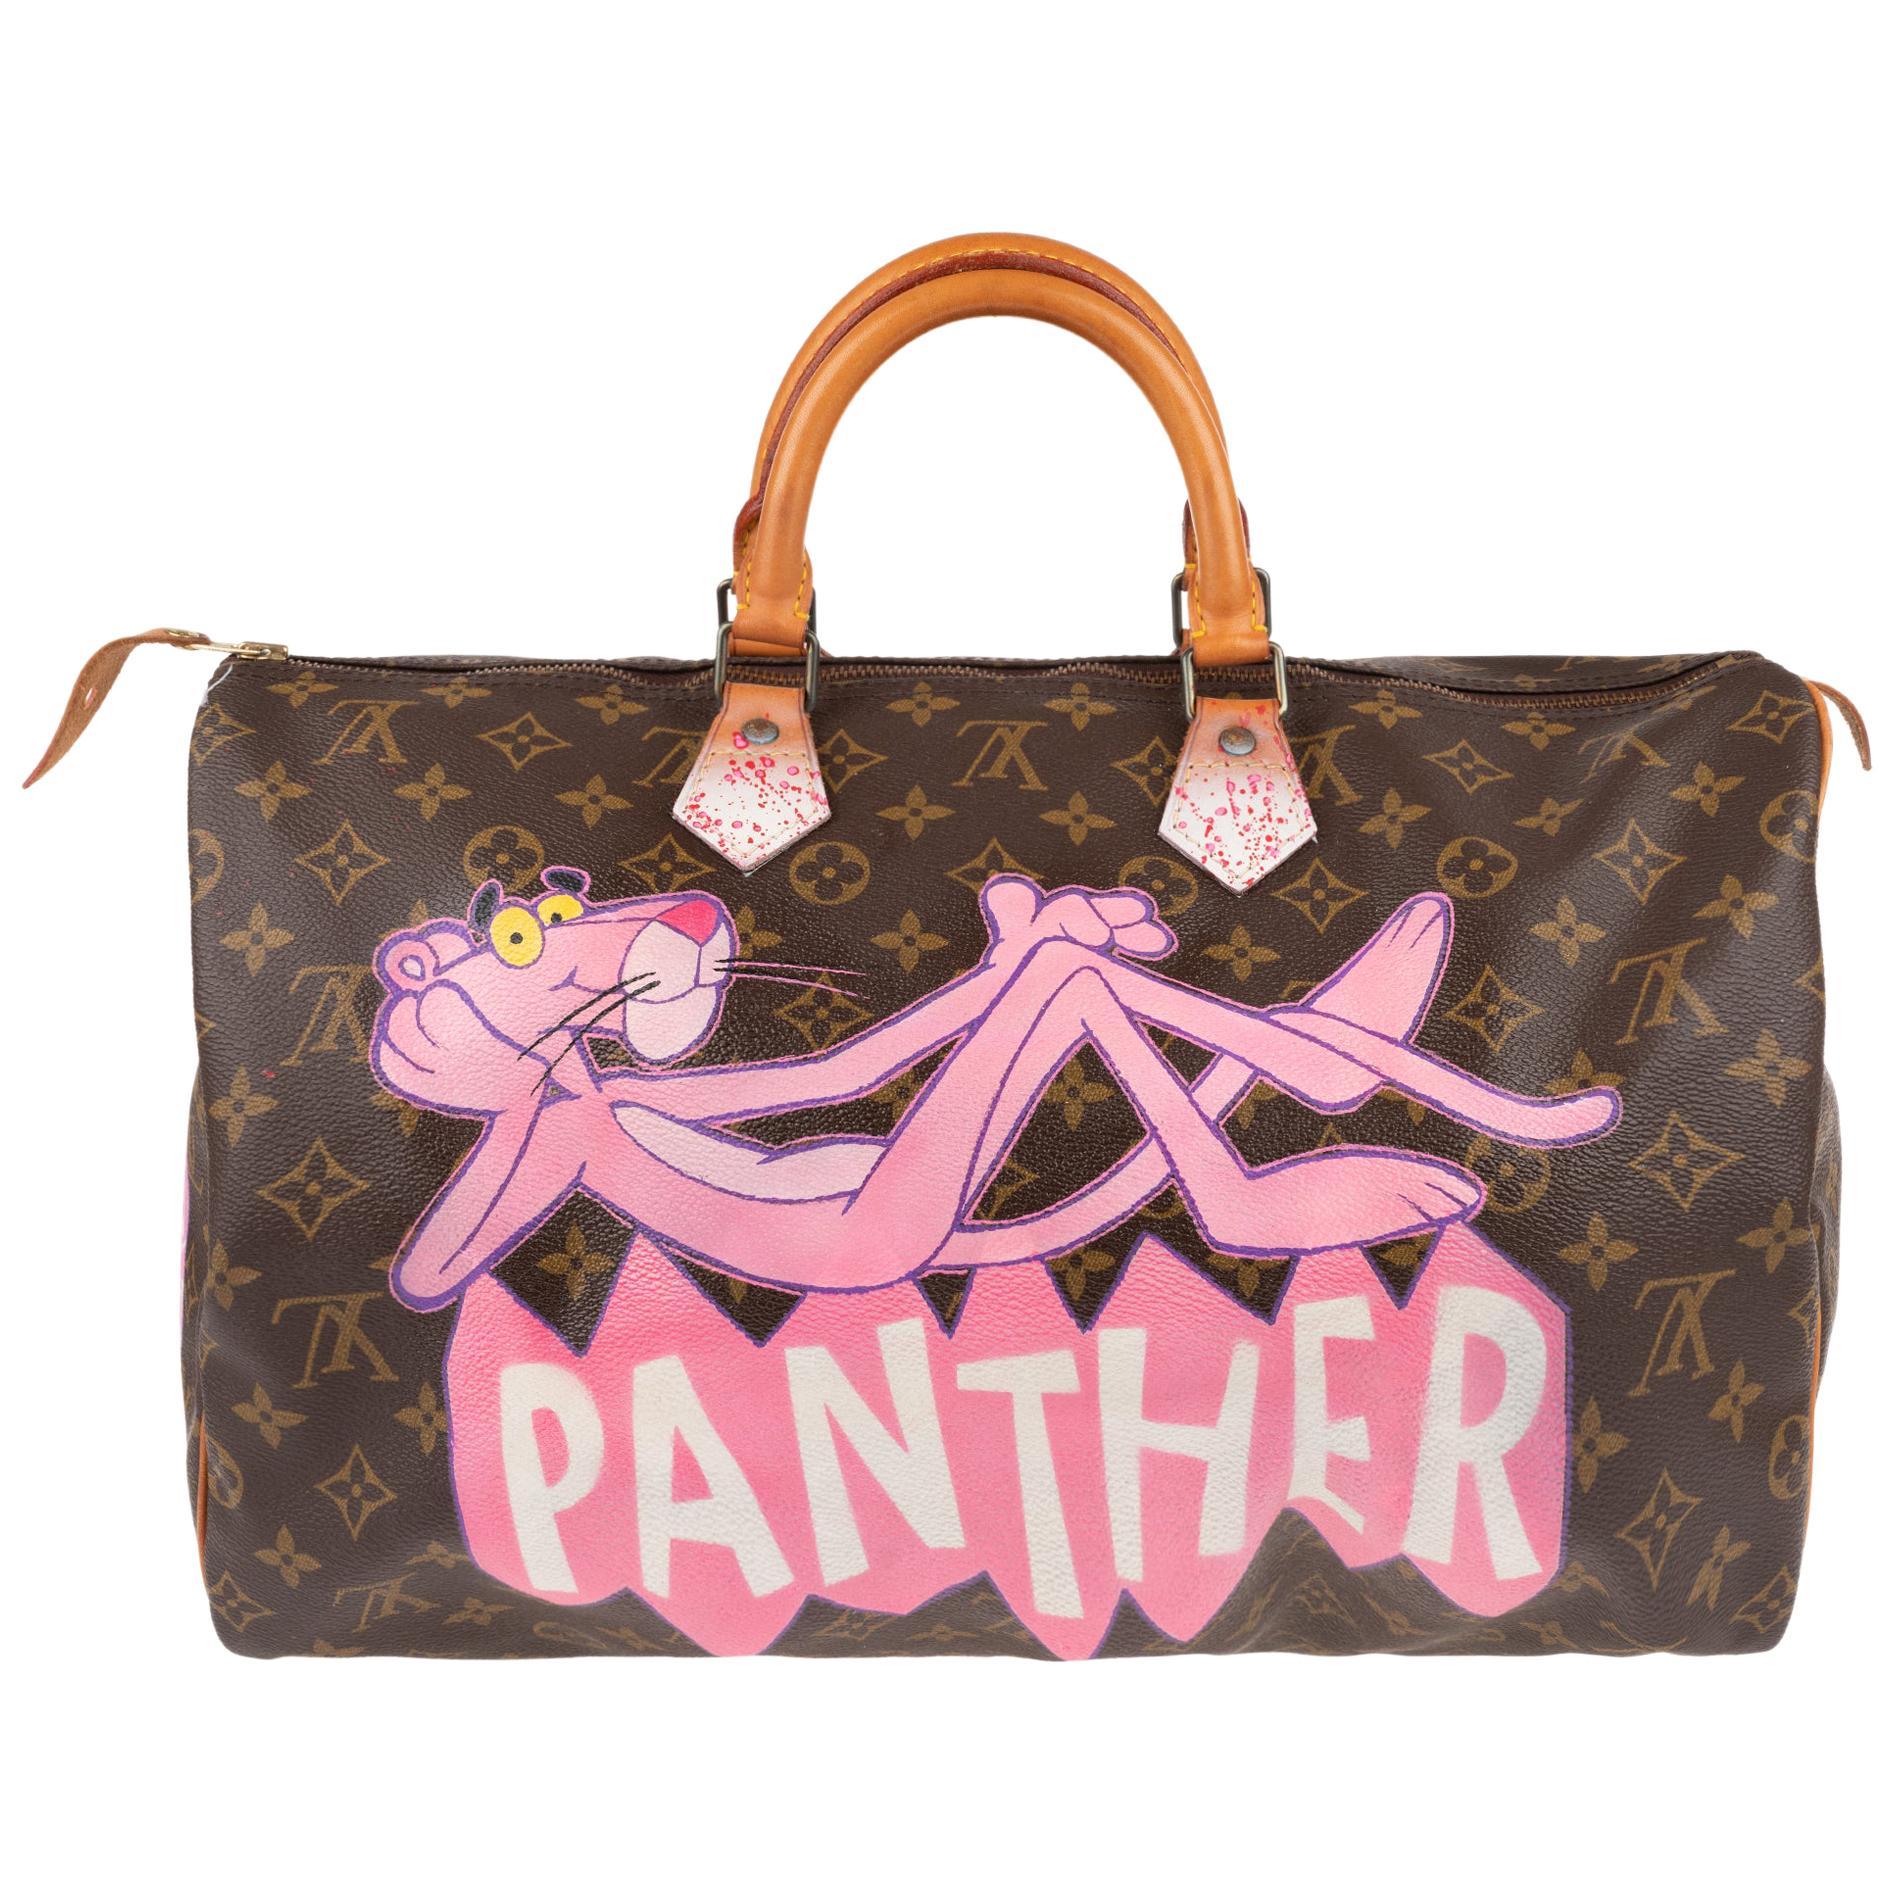 "Handbag Louis Vuitton Speedy 40 in Monogram canvas customized ""Pink Panther II"""